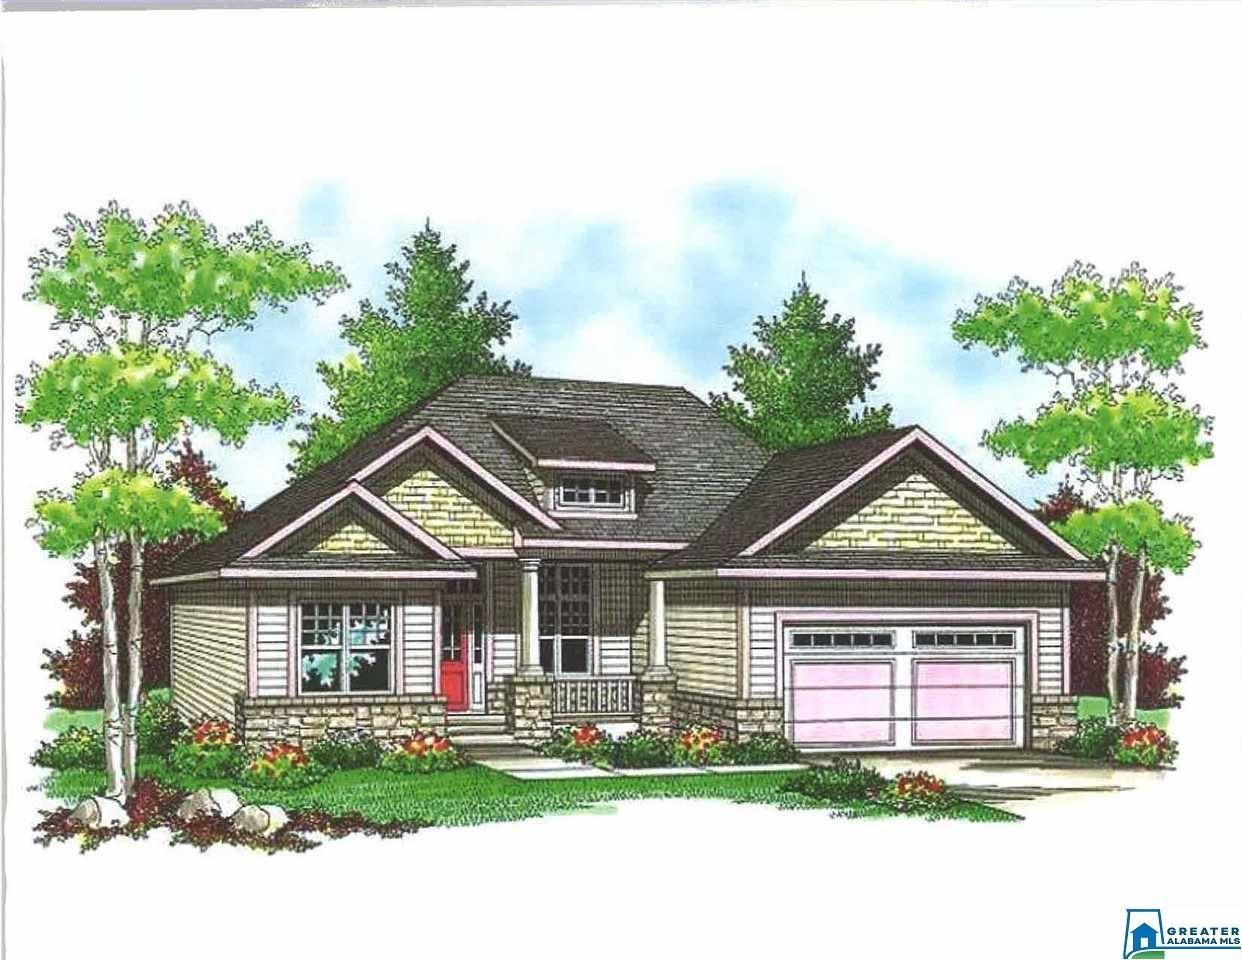 116 DEWEY LN, Anniston, AL 36207 - MLS#: 890329